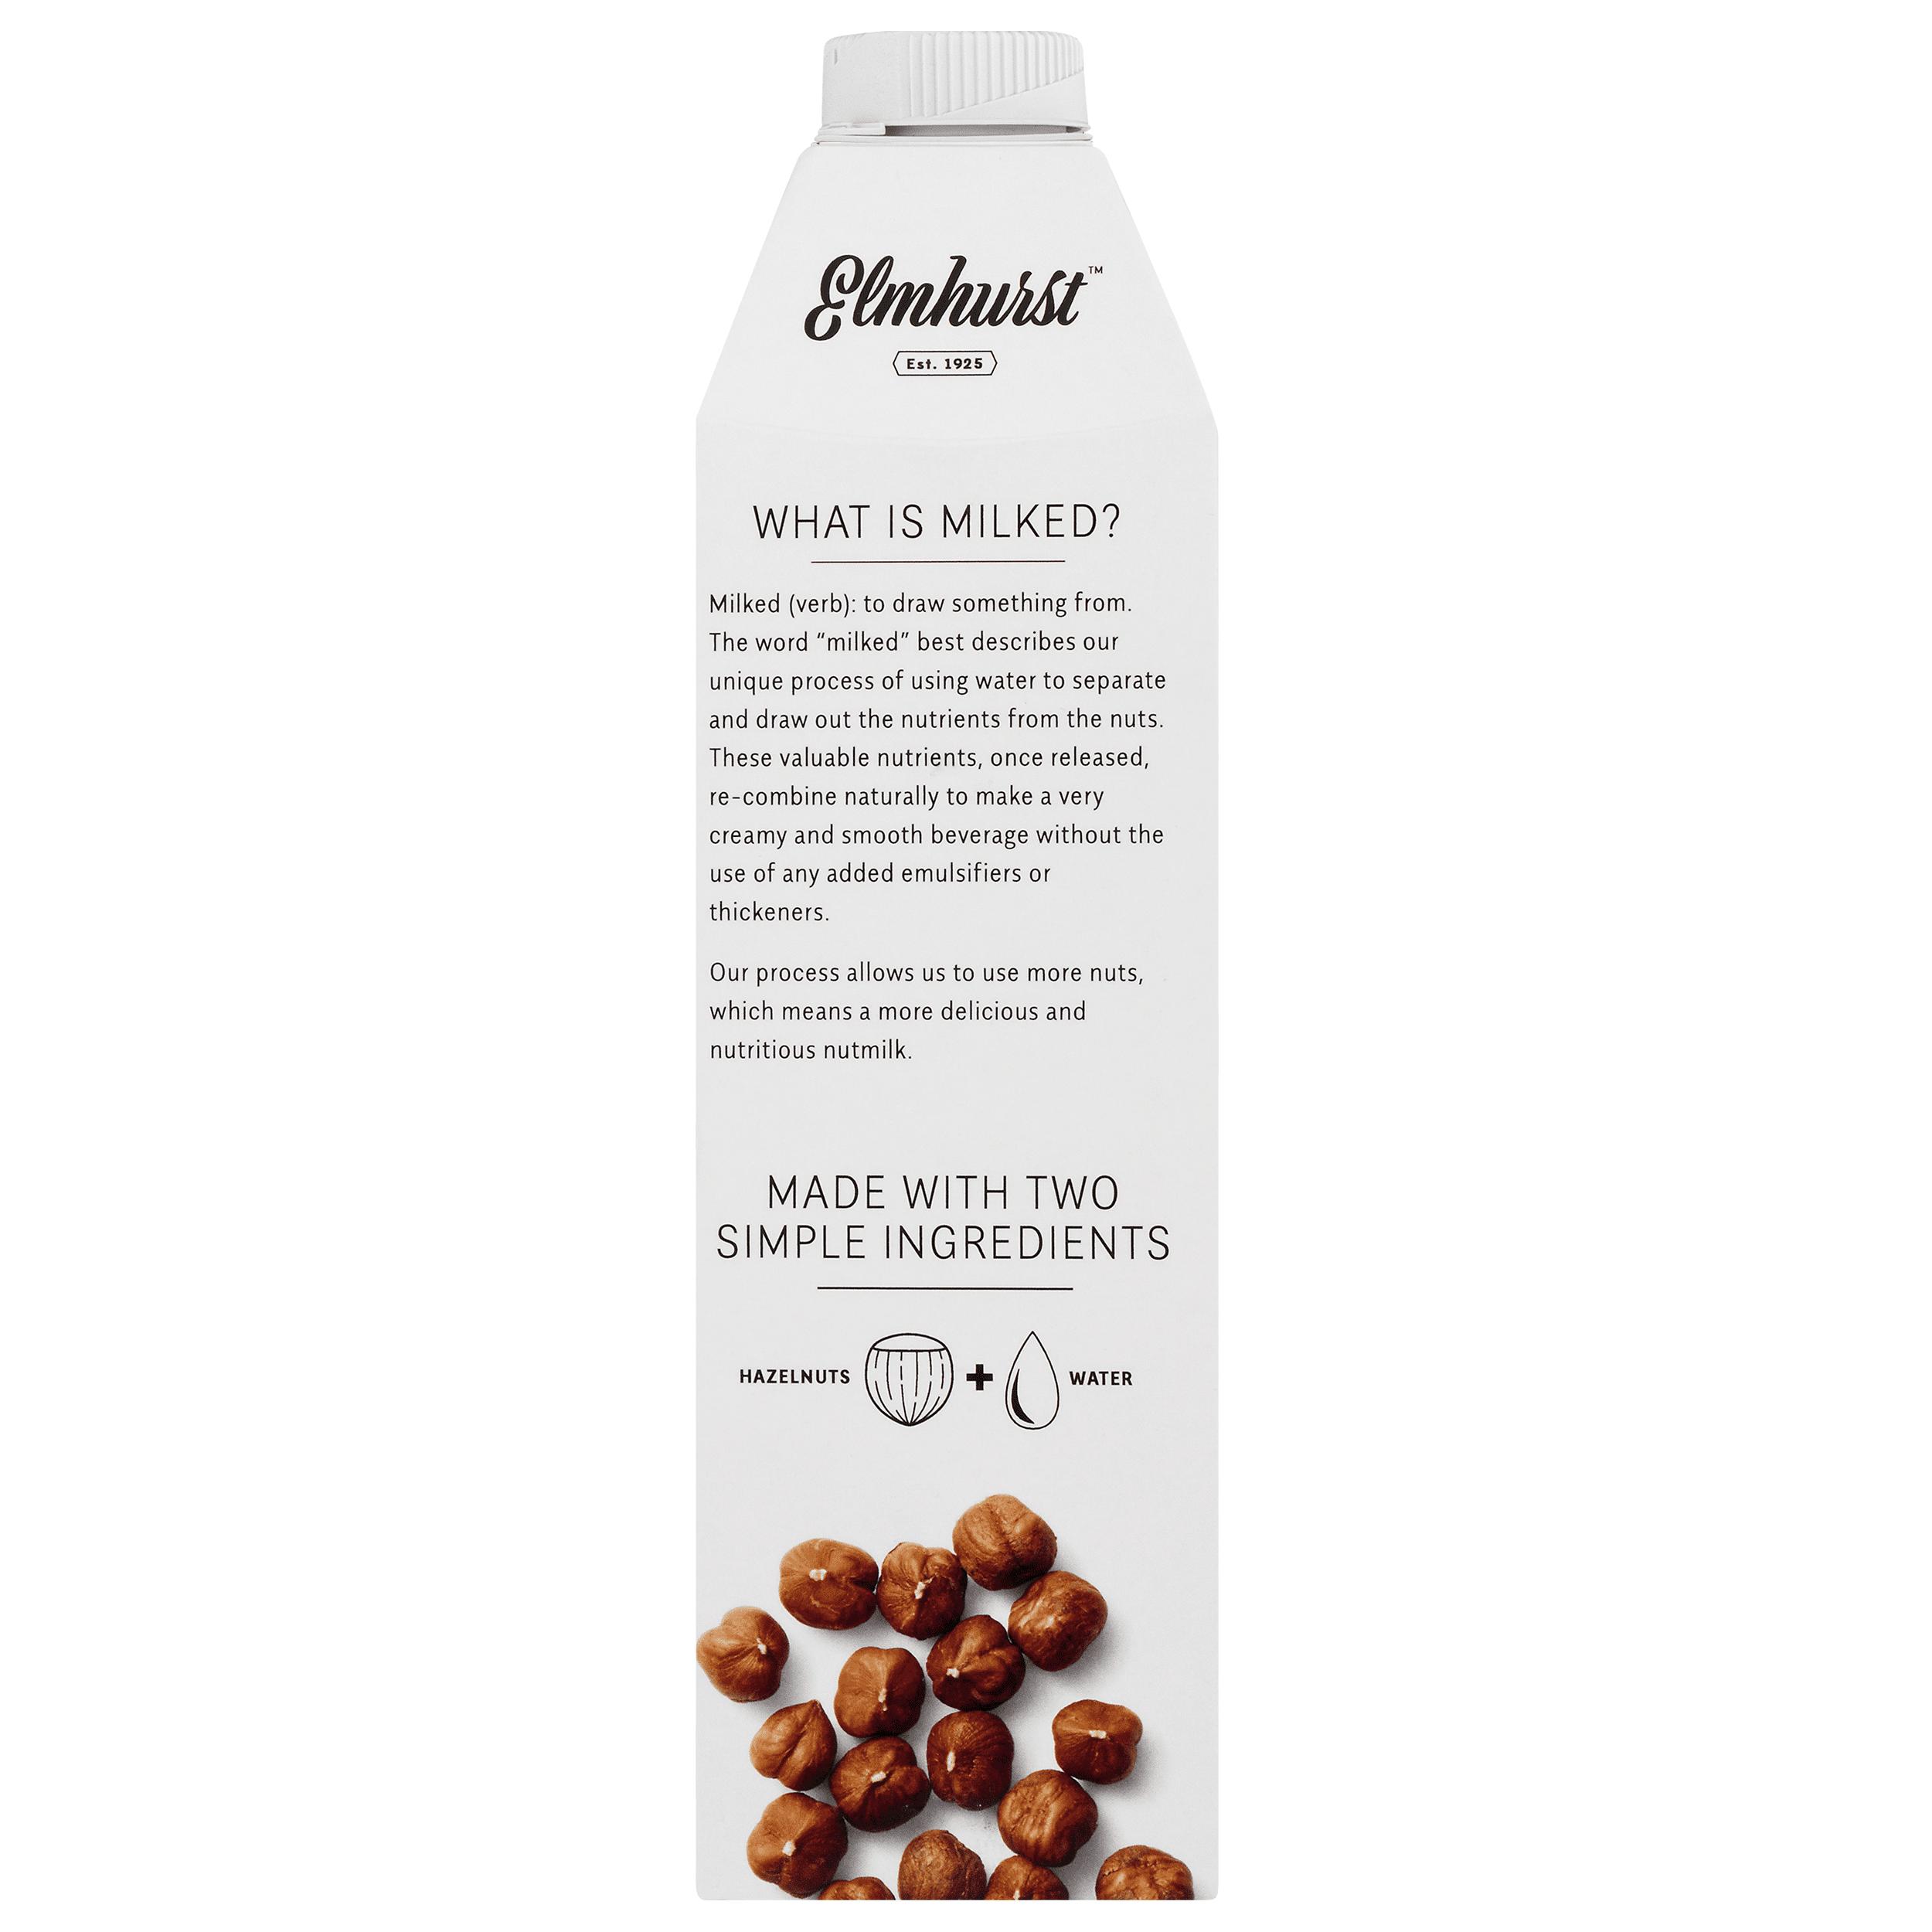 Elmhurst Milked Unsweetened Hazelnuts   32 Oz Non Dairy Hazelnut Milk    Walmart.com